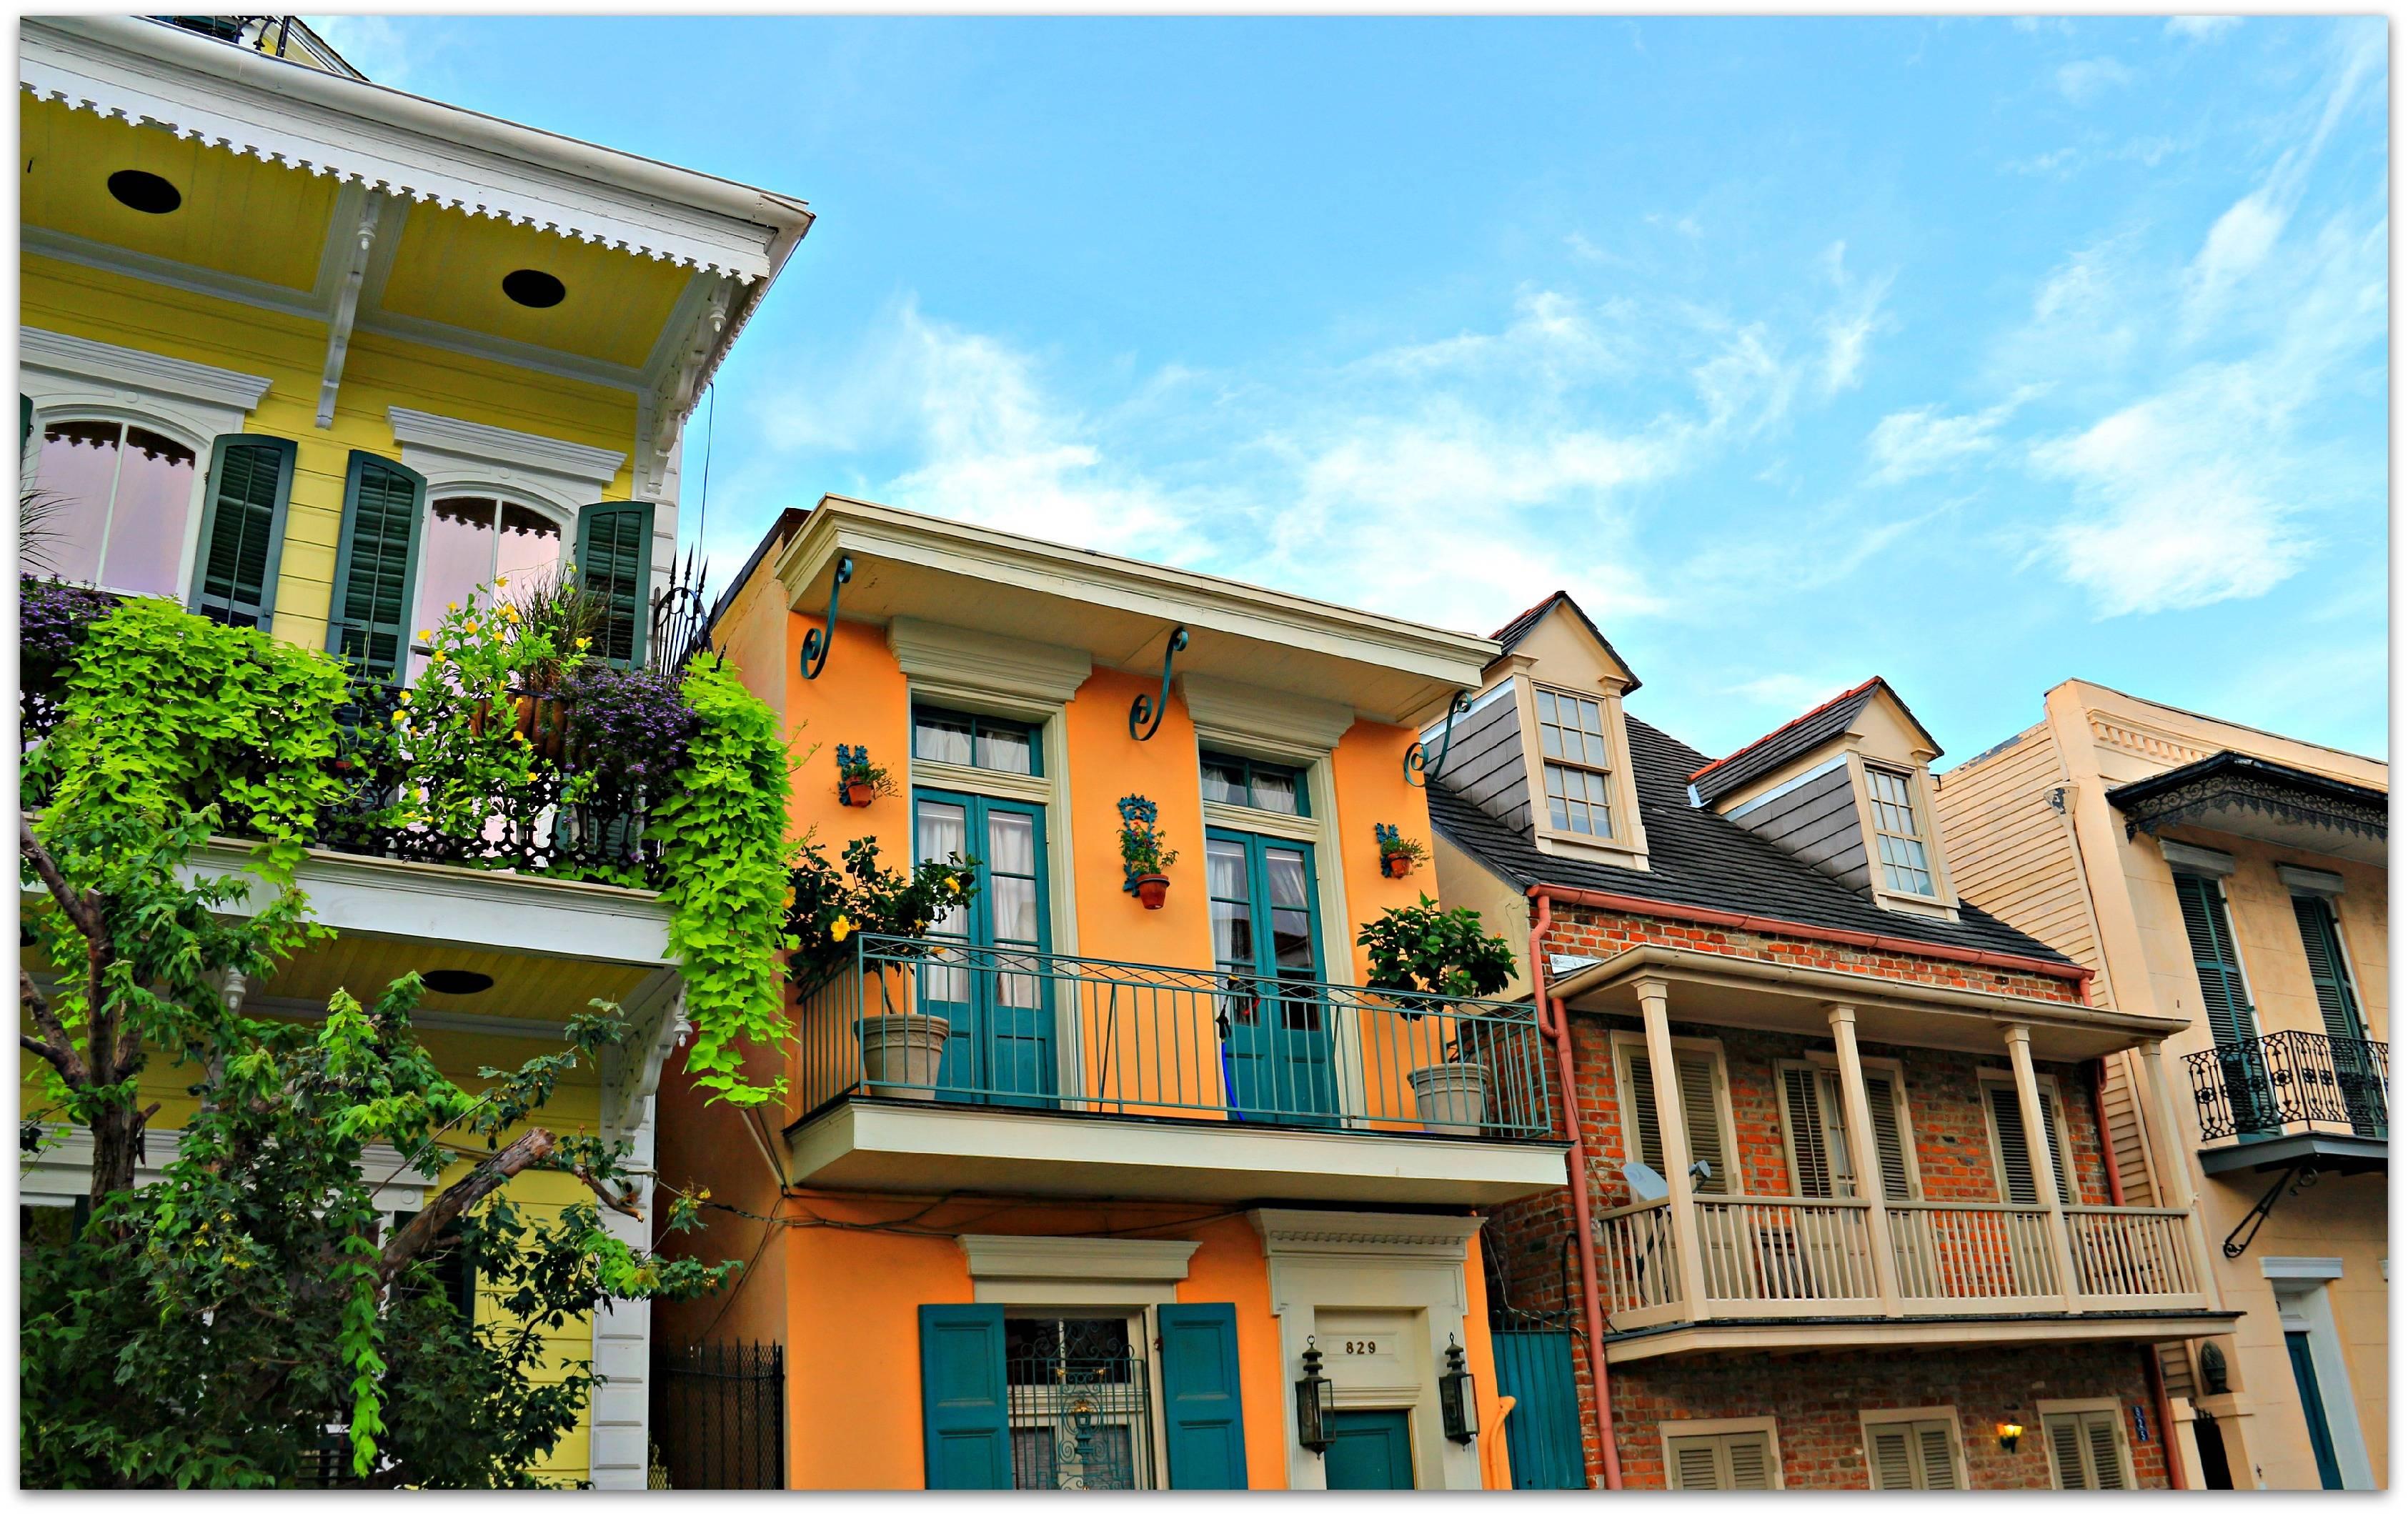 New Orleans Homes Neighborhoods French Quarter